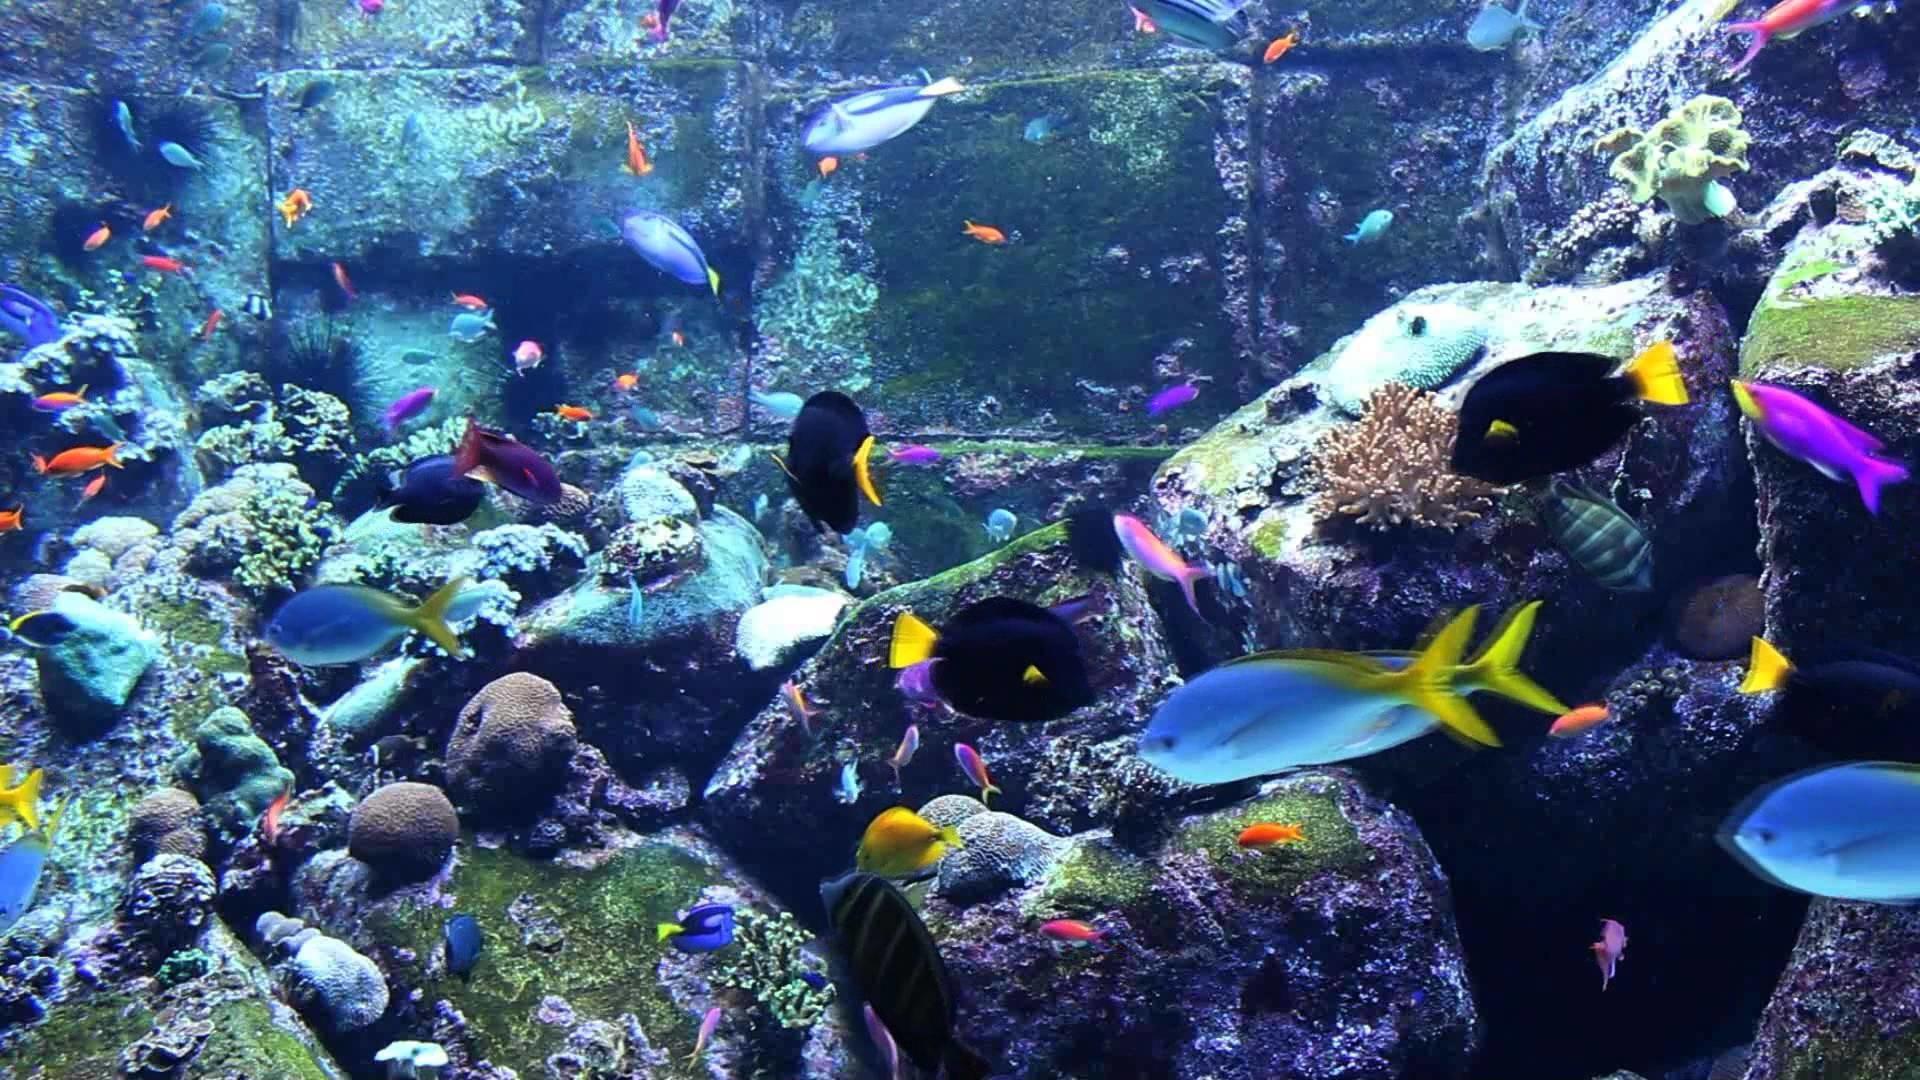 Aquarium live wallpaper for pc 55 images for Saltwater fish online